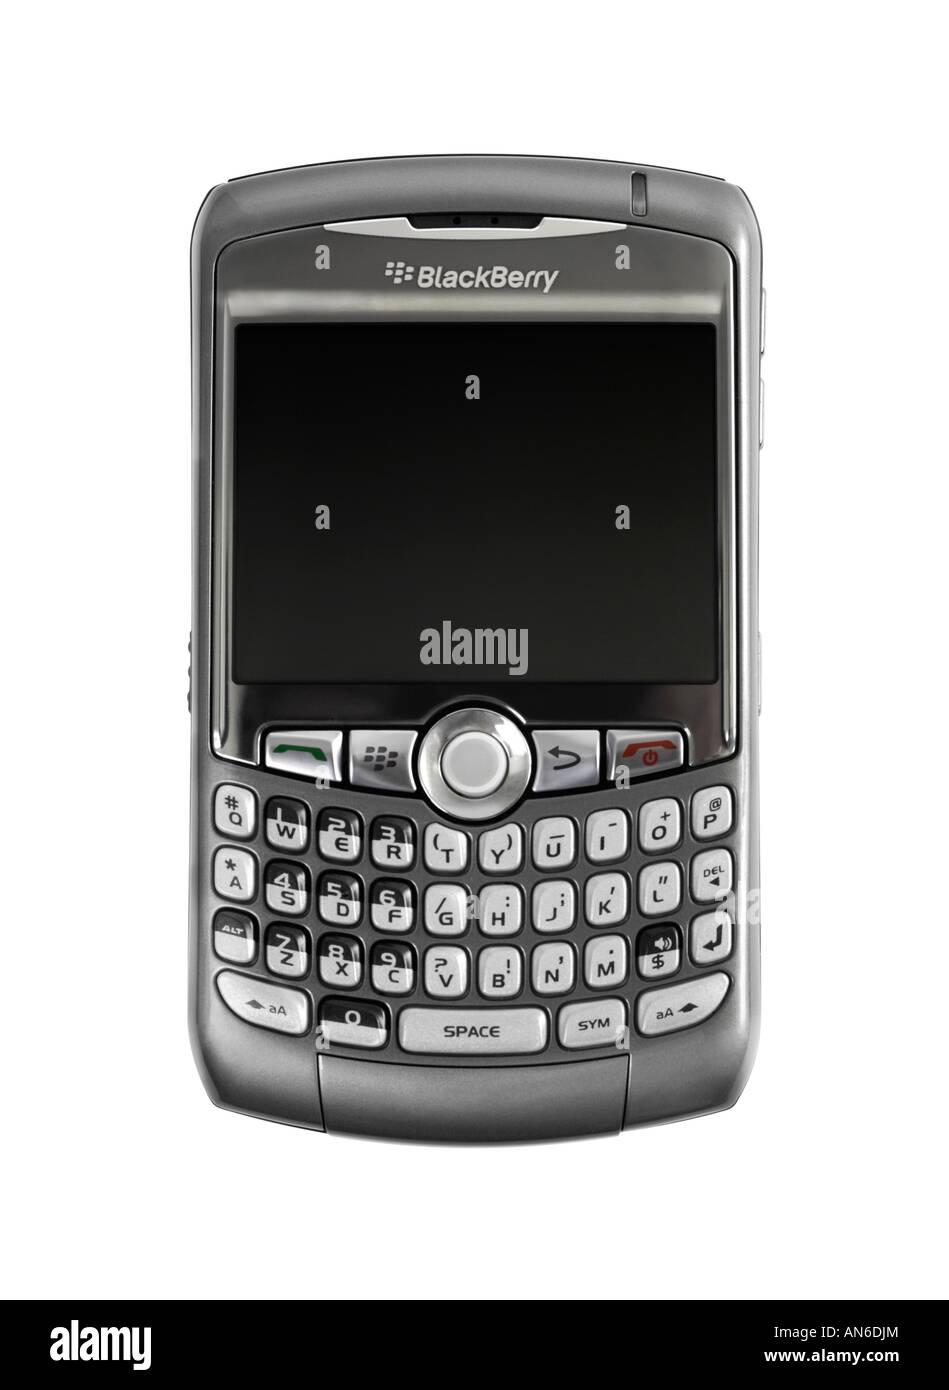 BlackBerry 8310 Curve Smartphone - Stock Image